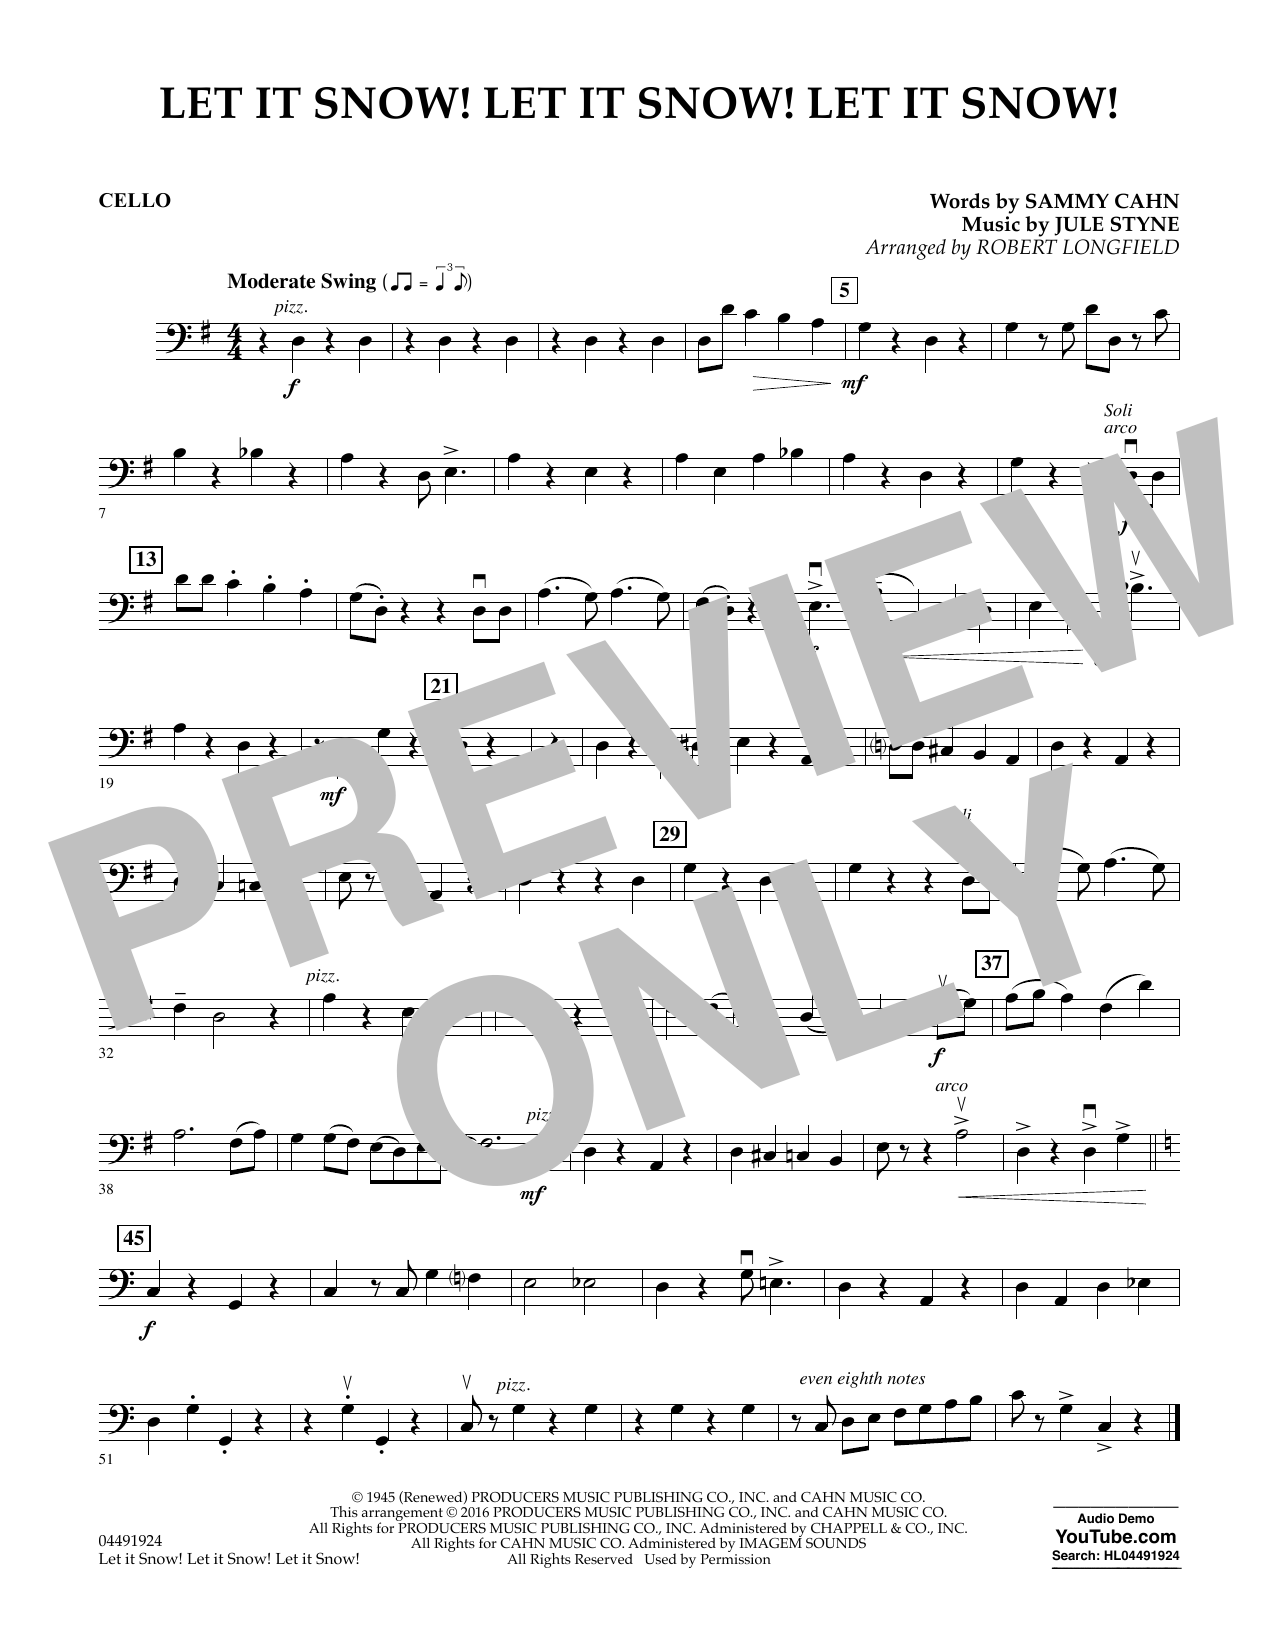 Let It Snow! Let It Snow! Let It Snow! - Cello Sheet Music